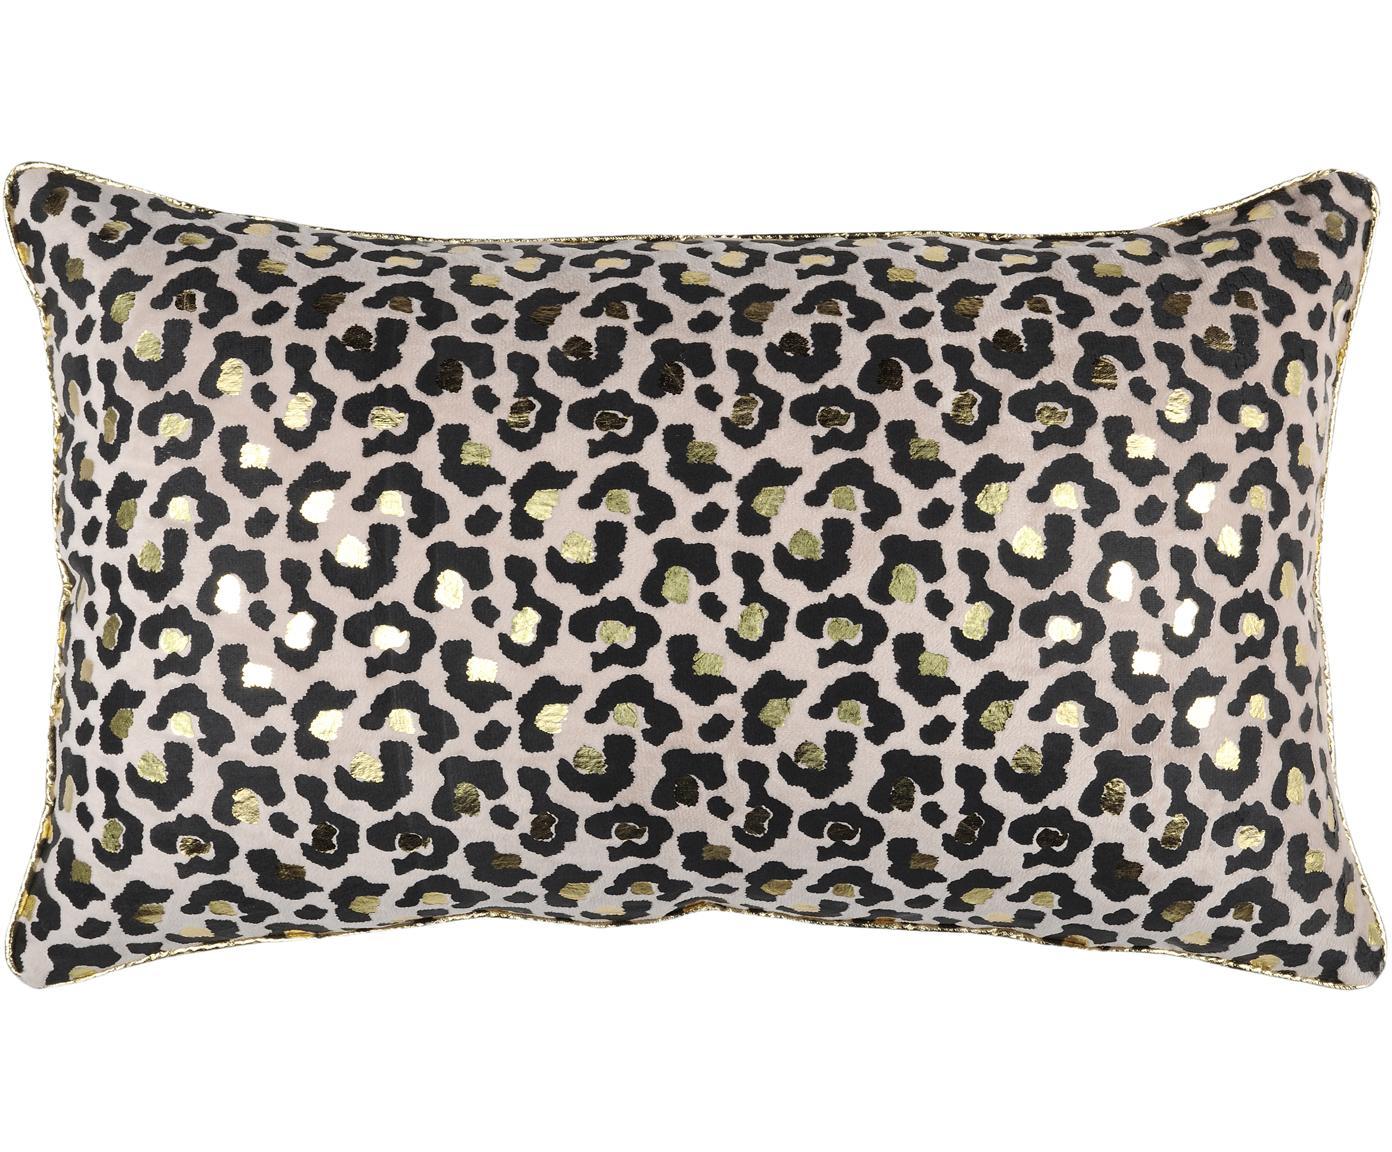 Kussen Jangal met luipaardpatroon  en goudkleurige details, met vulling, 100% polyester, Zwart, beige, goudkleurig, 30 x 50 cm